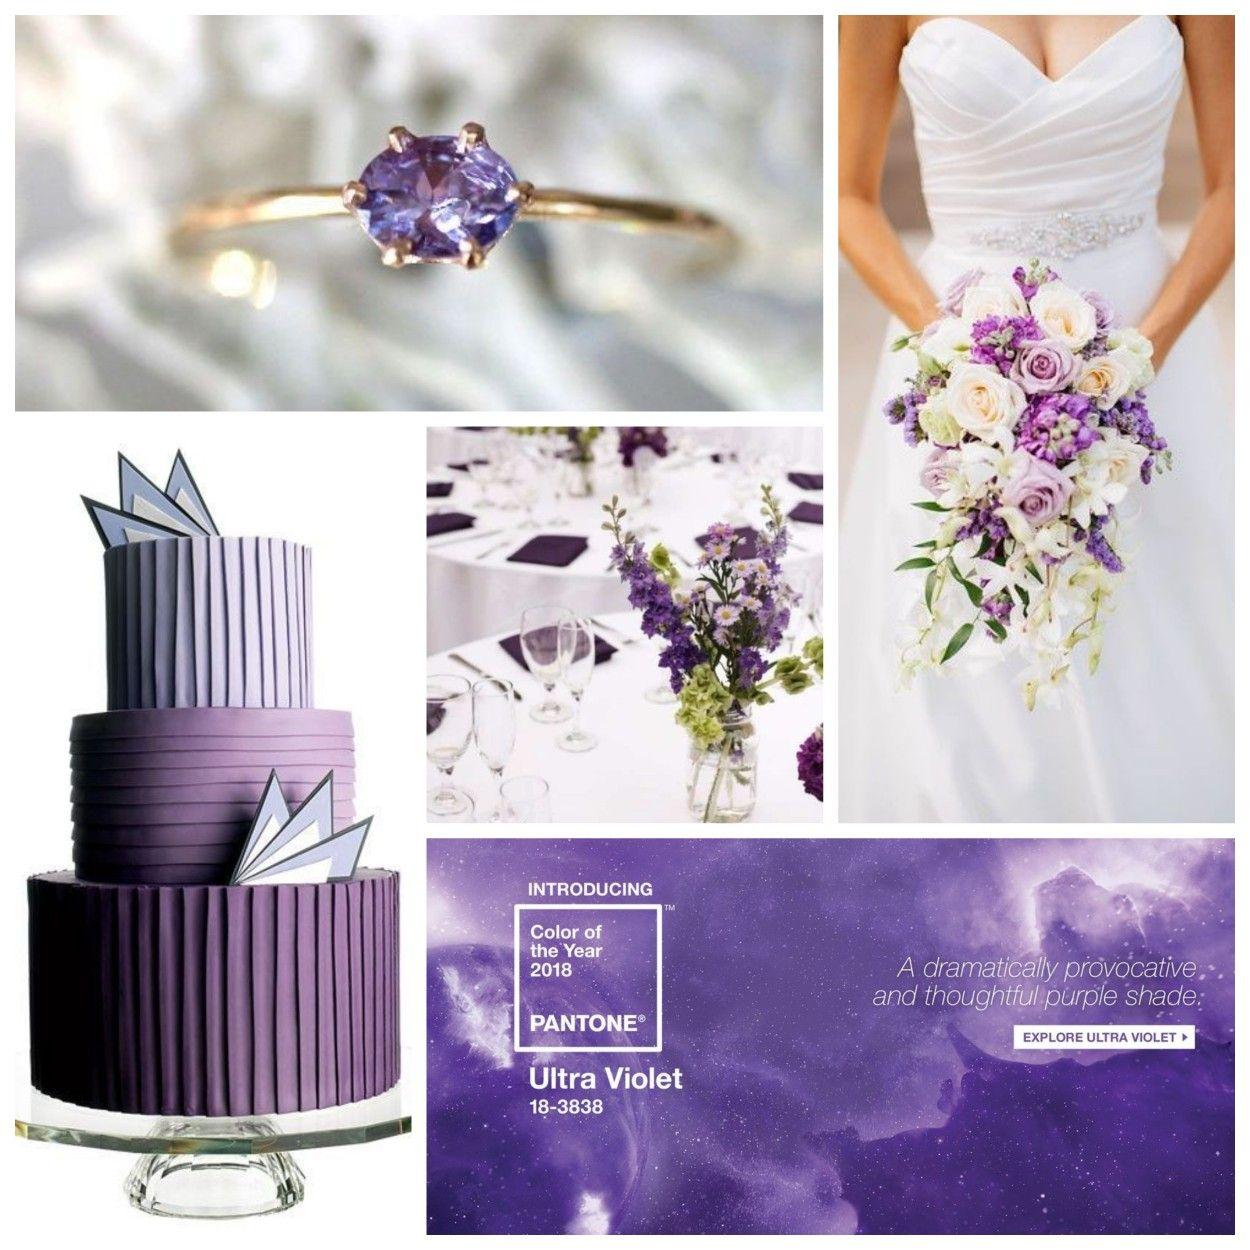 Pantone's colour of the year ❤ #colouroftheyear #ultraviolet #greekweddinginspiration #weddingingreece #greekweddingplanner